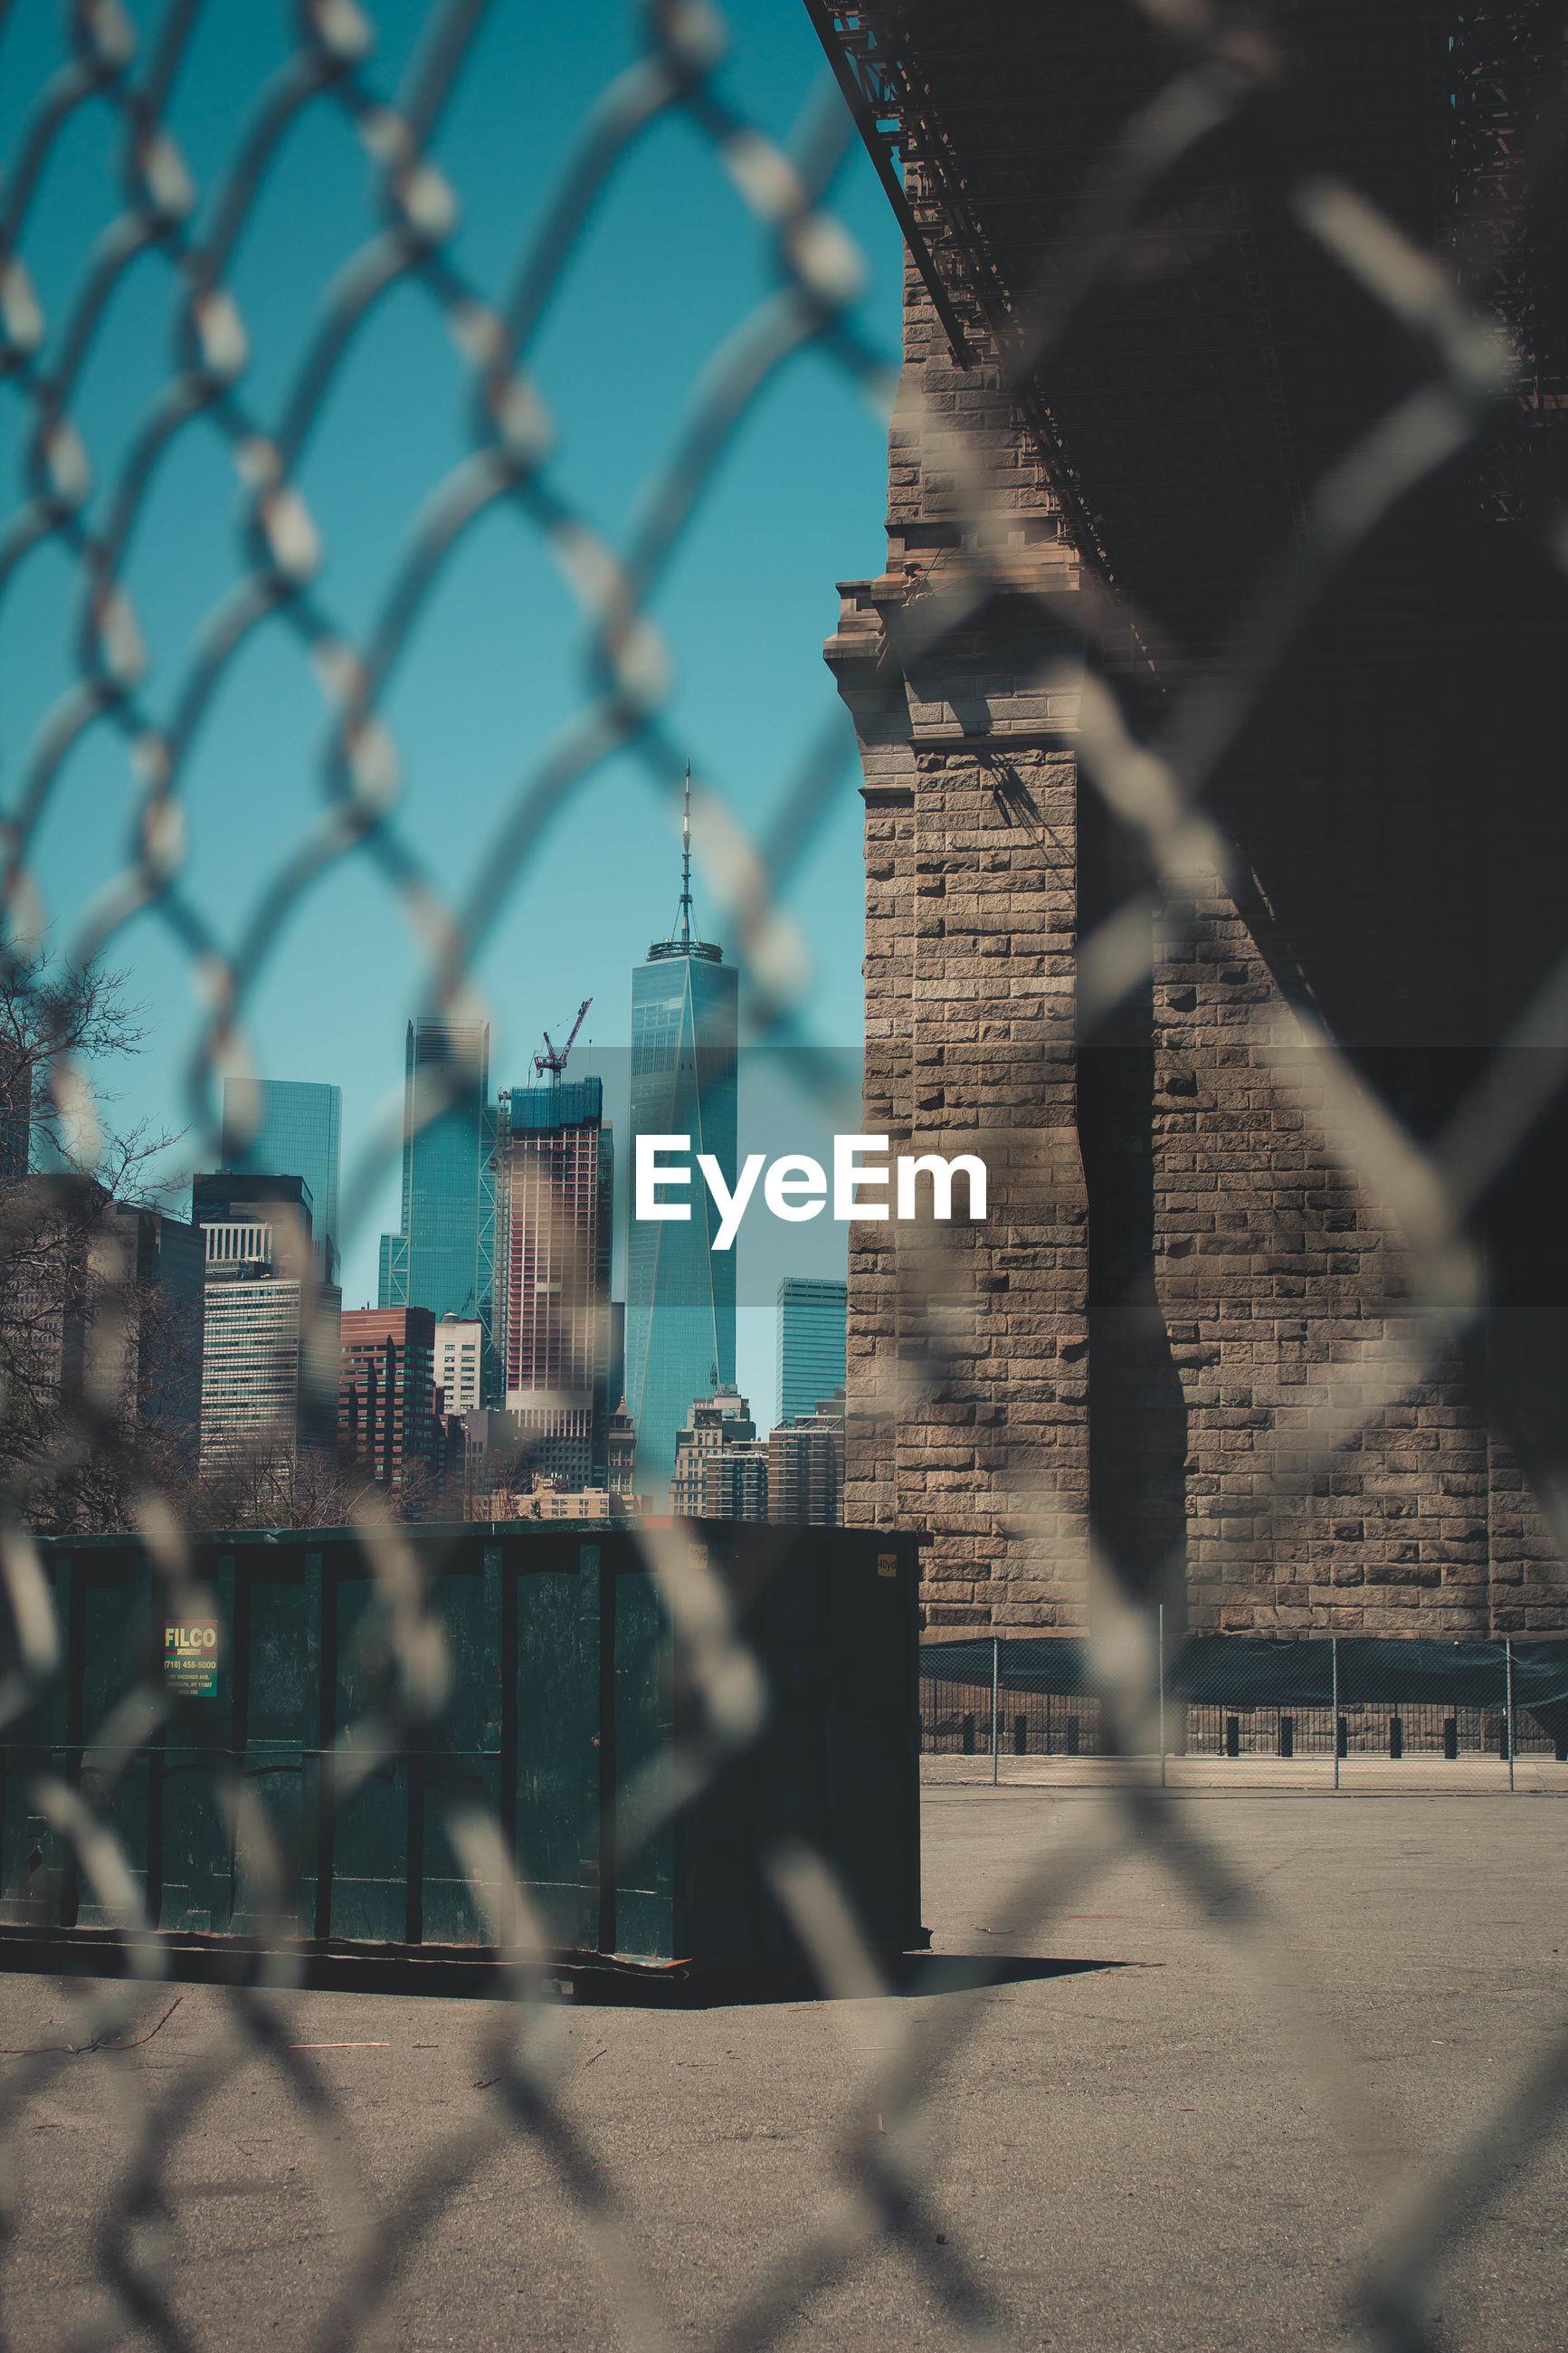 Cityscape seen through chainlink fence against sky